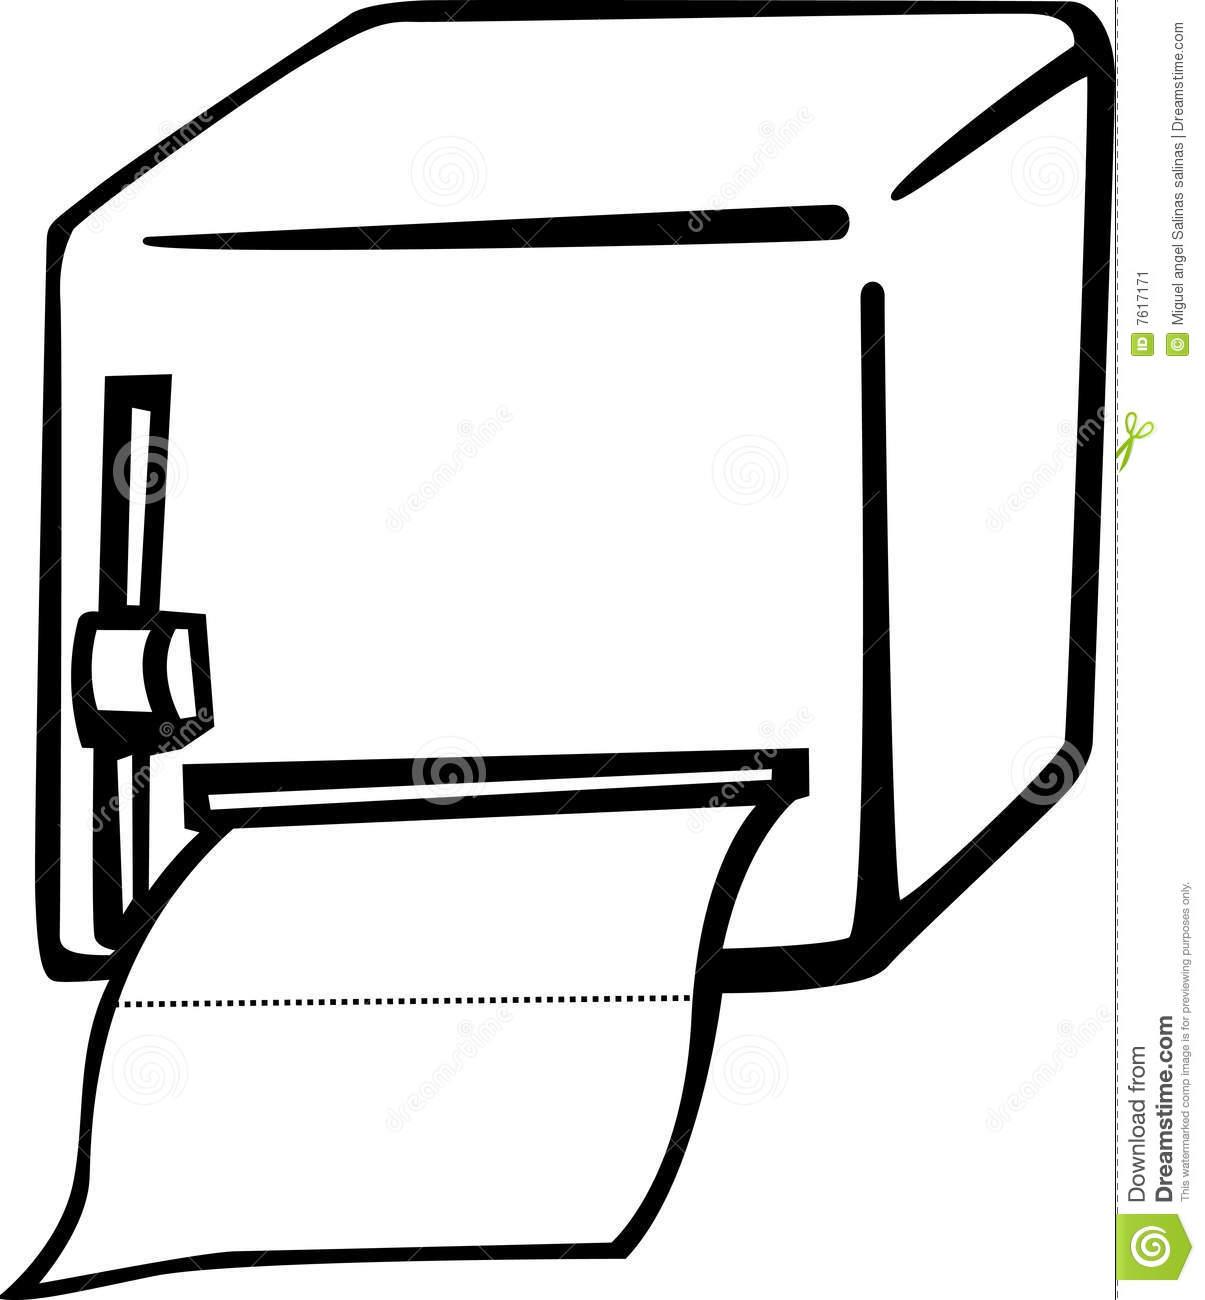 Paper Towel Dispenser Clipart.